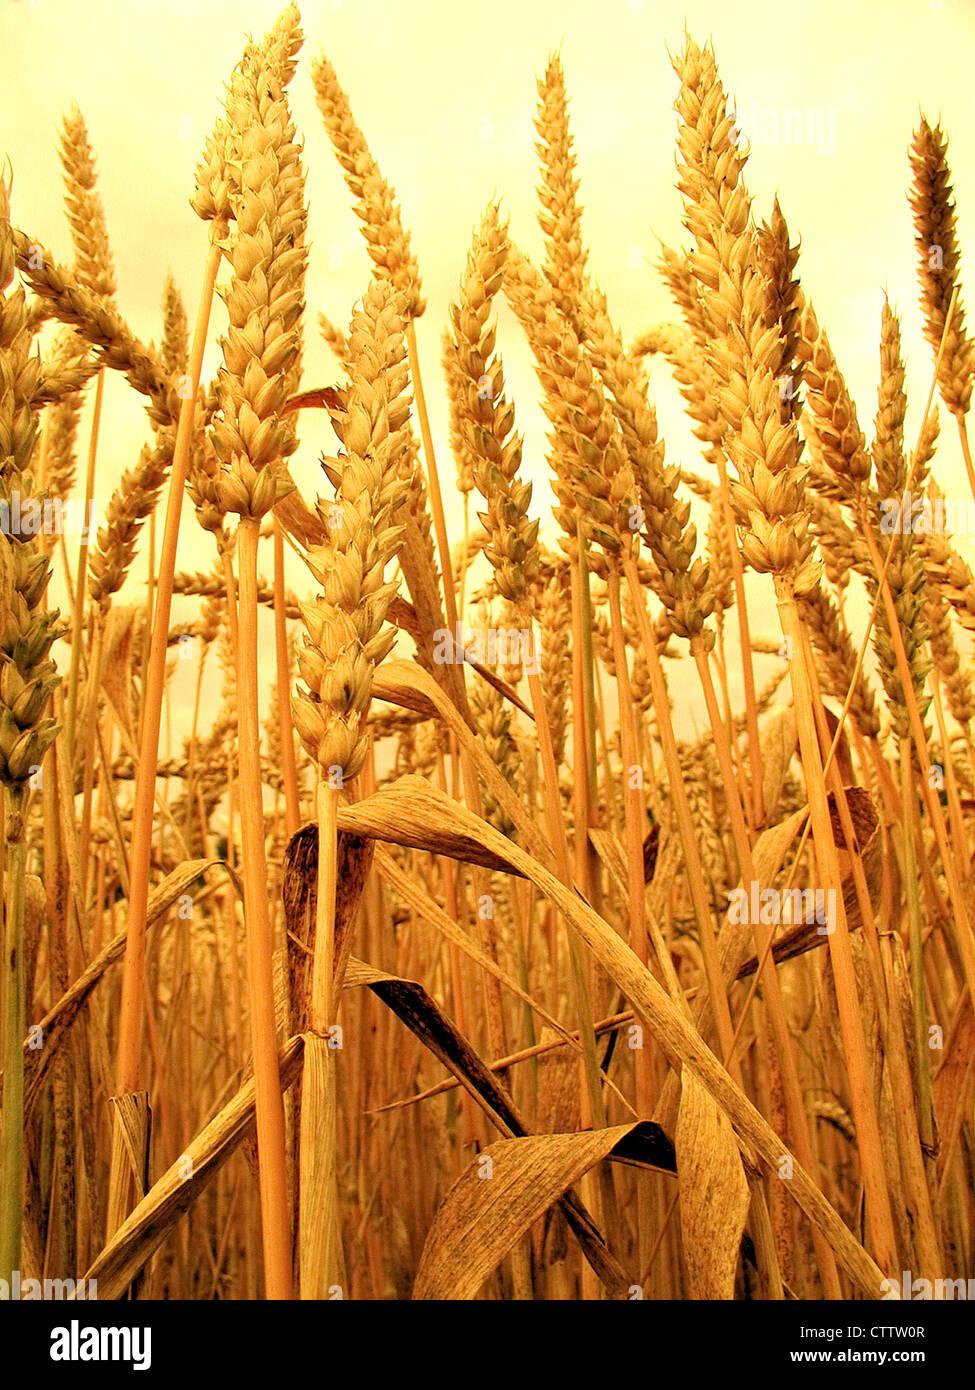 Trigo - Weizenähren Imagen De Stock